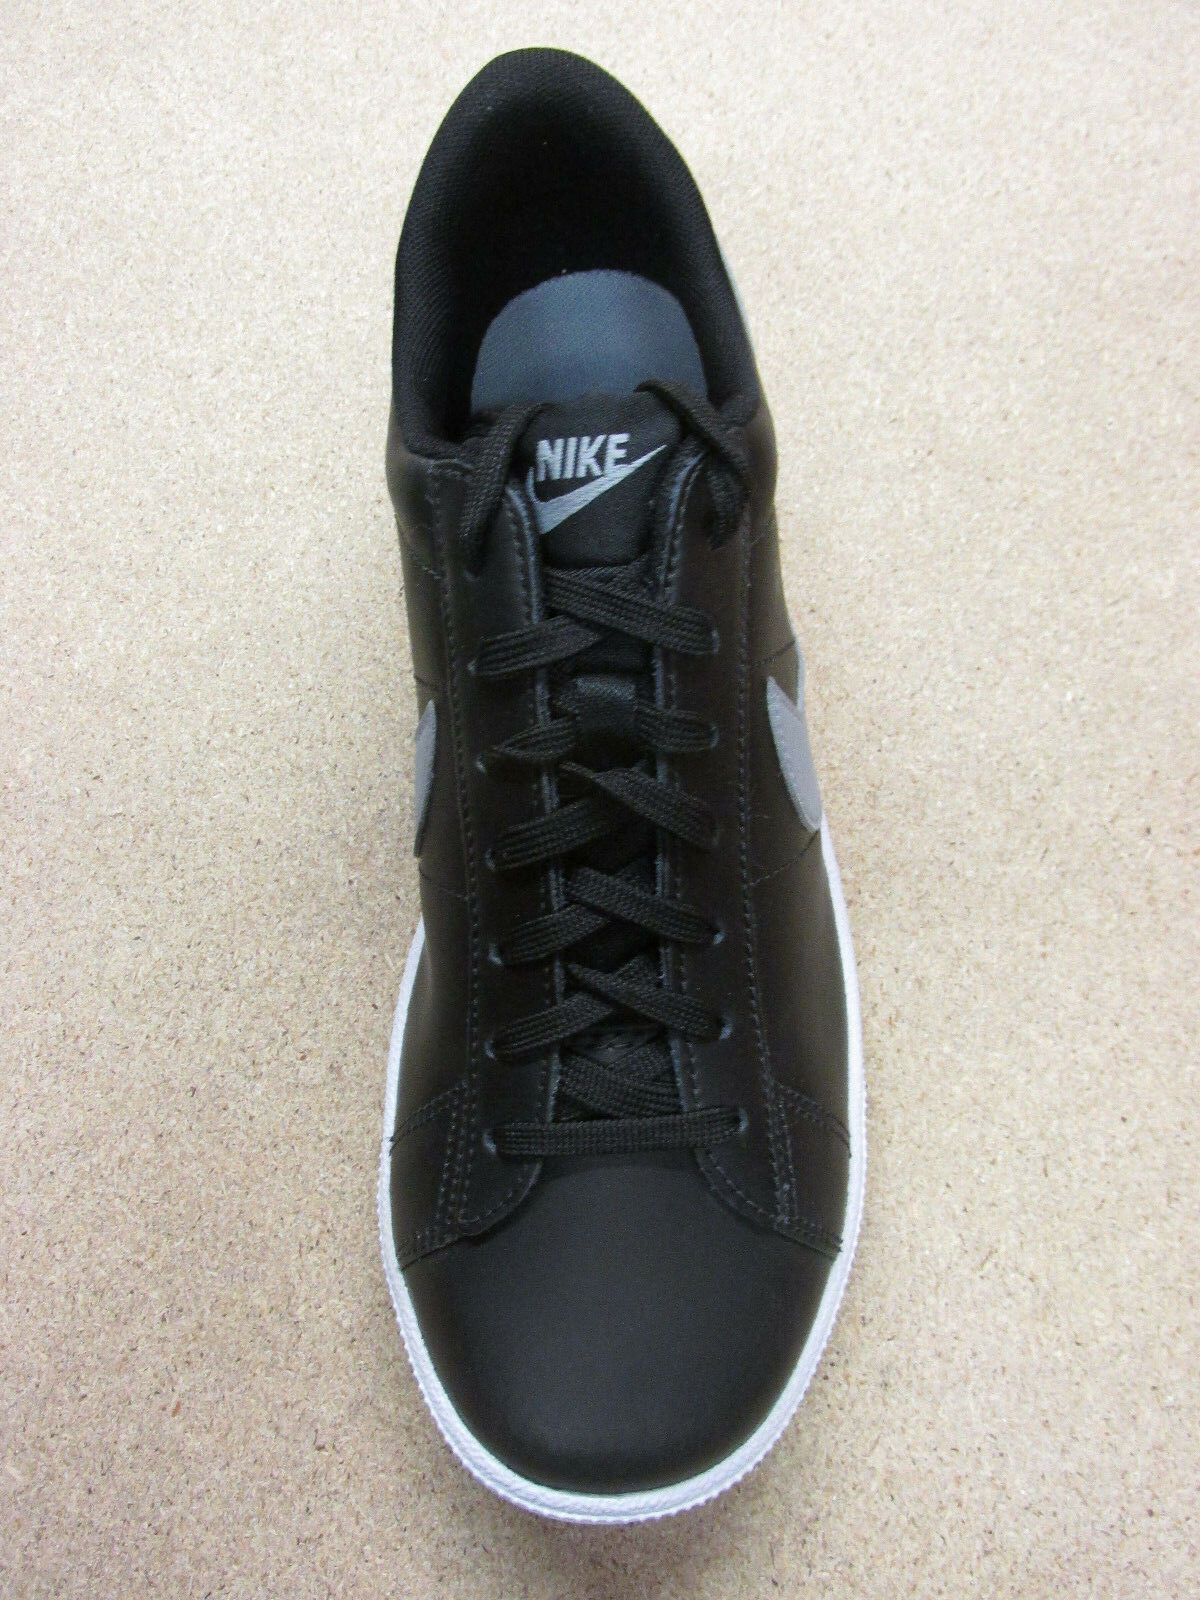 Nike Tennis Klassisch Cs Turnschuhe Herren Turnschuhe 683613 012 Turnschuhe Cs 7246f5